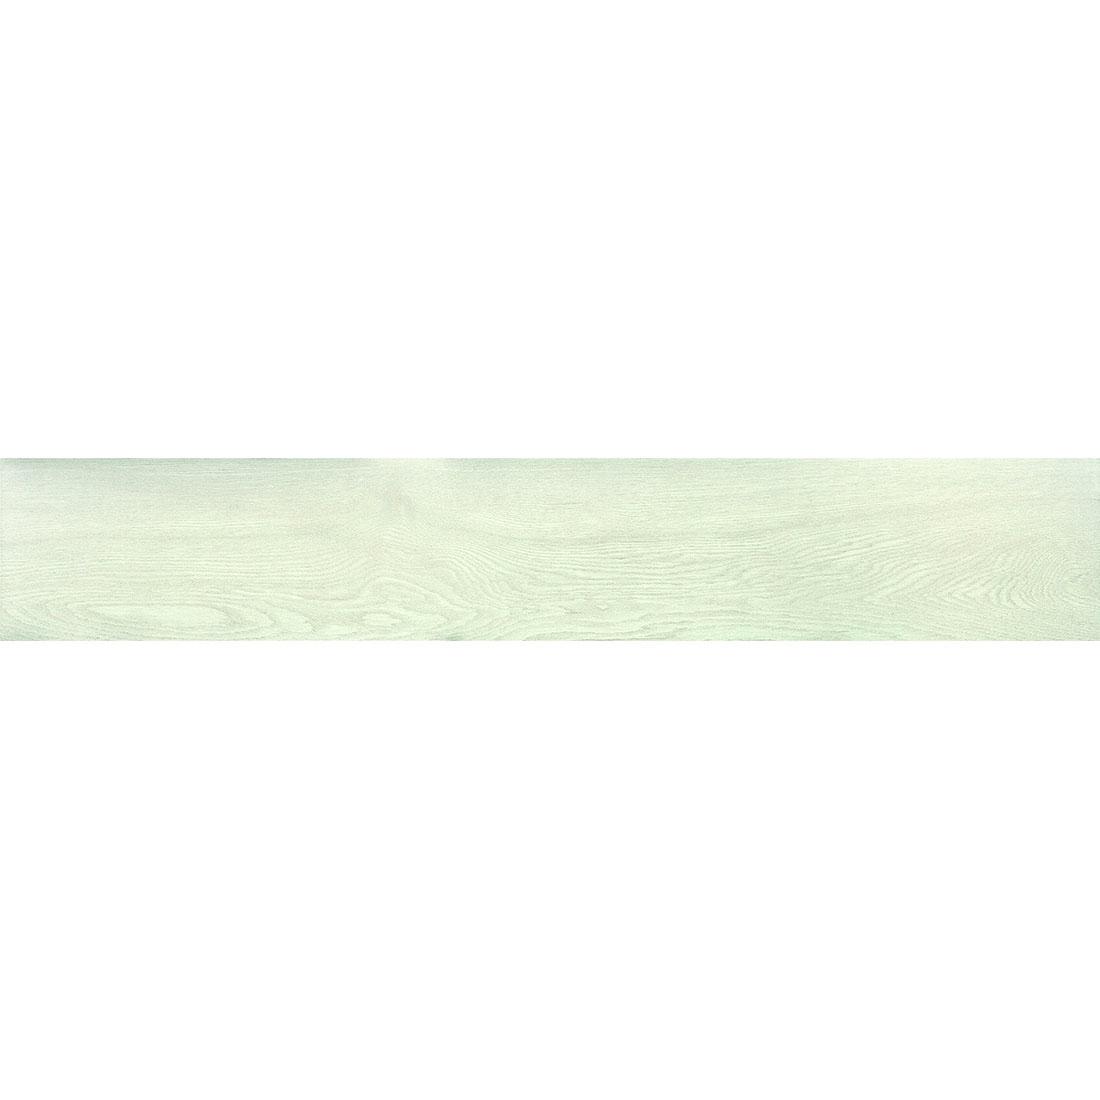 Candlewood 20x120 Blanco Gloss 1